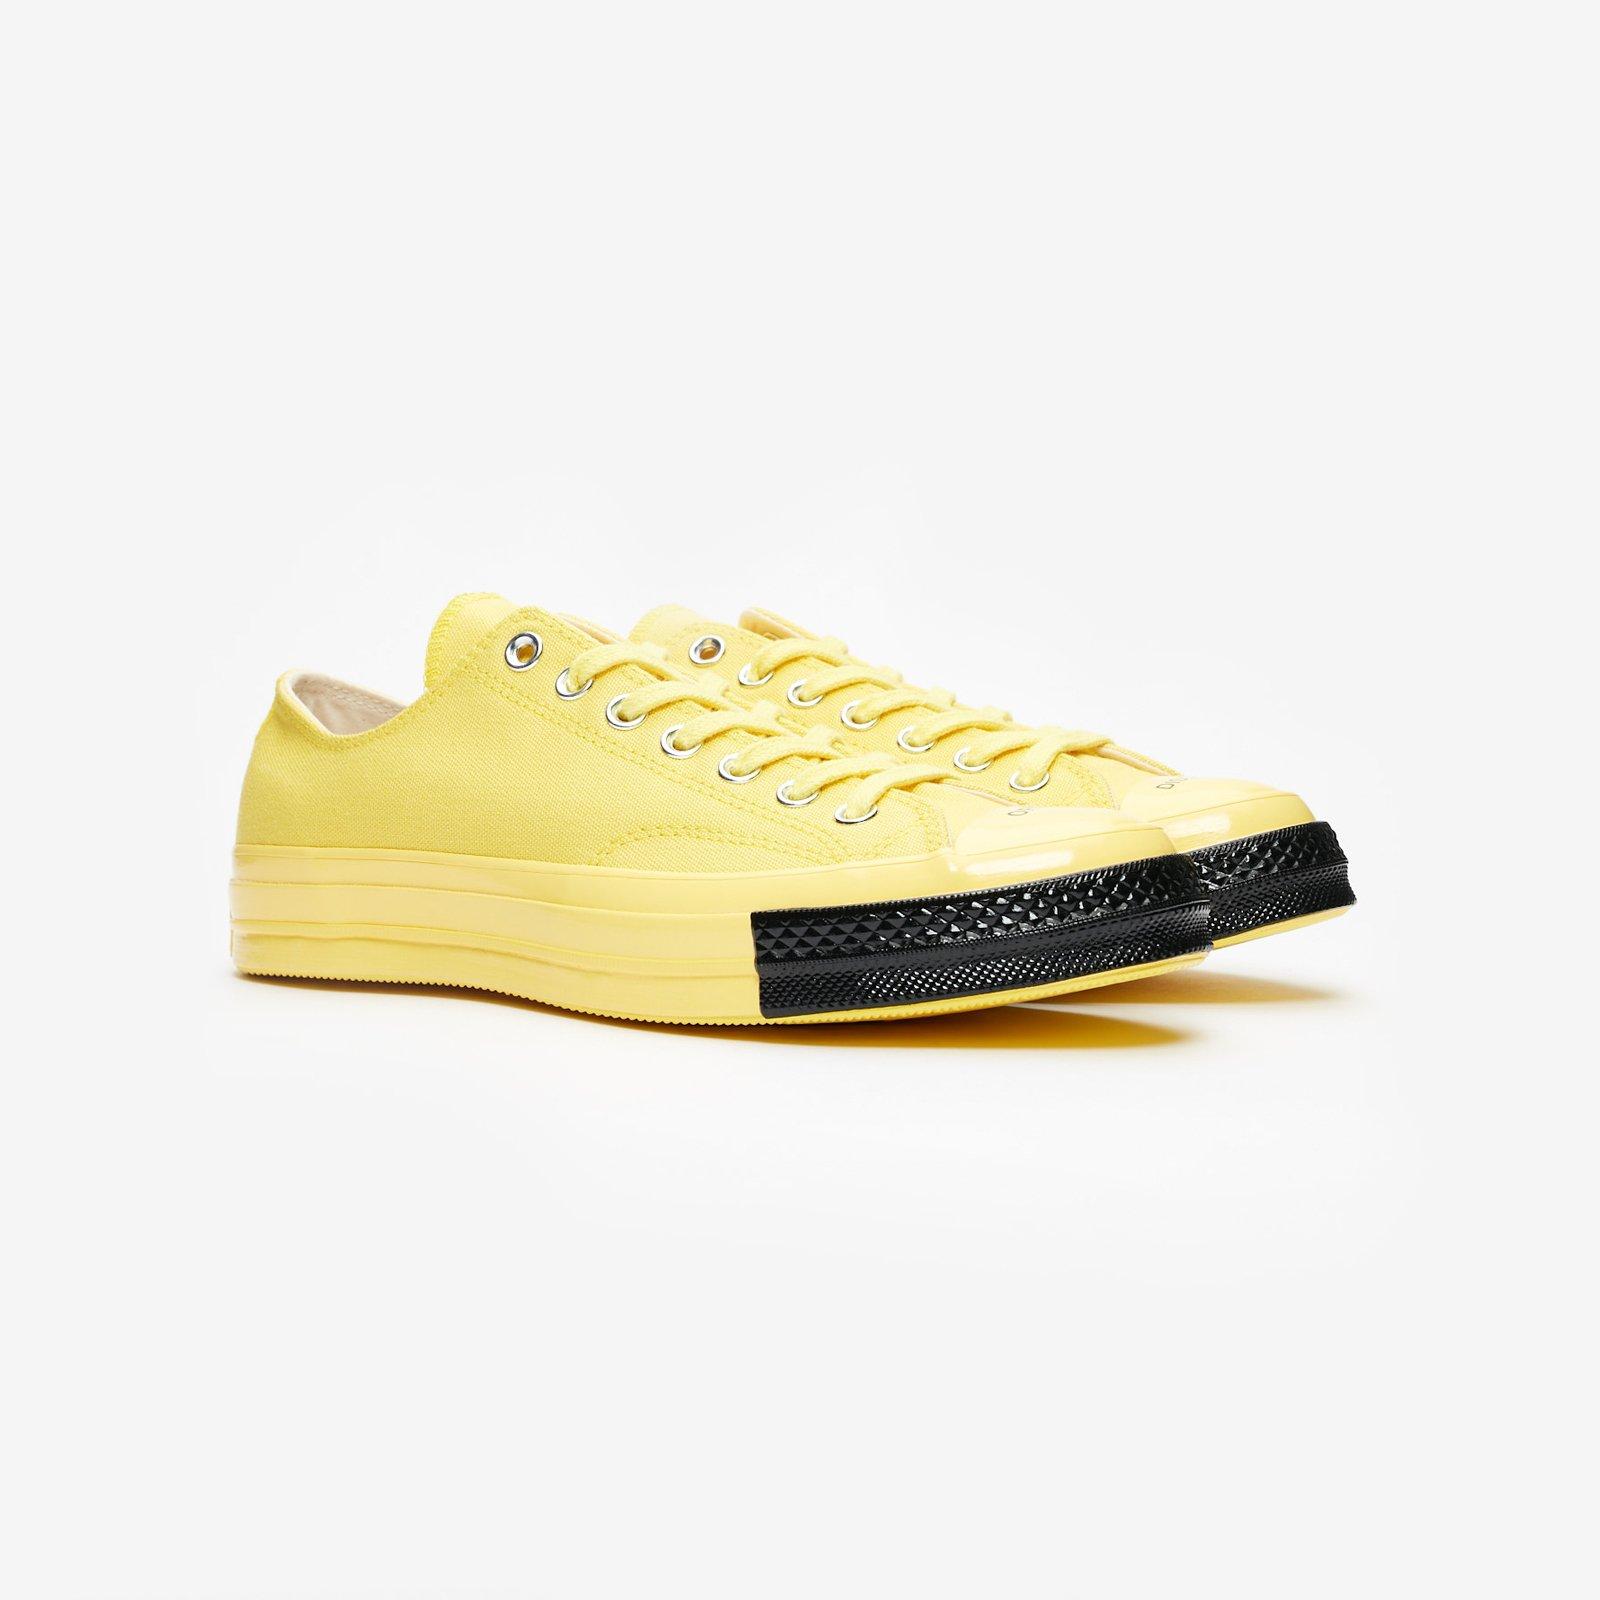 Converse Chuck 70 OX x Undercover 163011c Sneakersnstuff